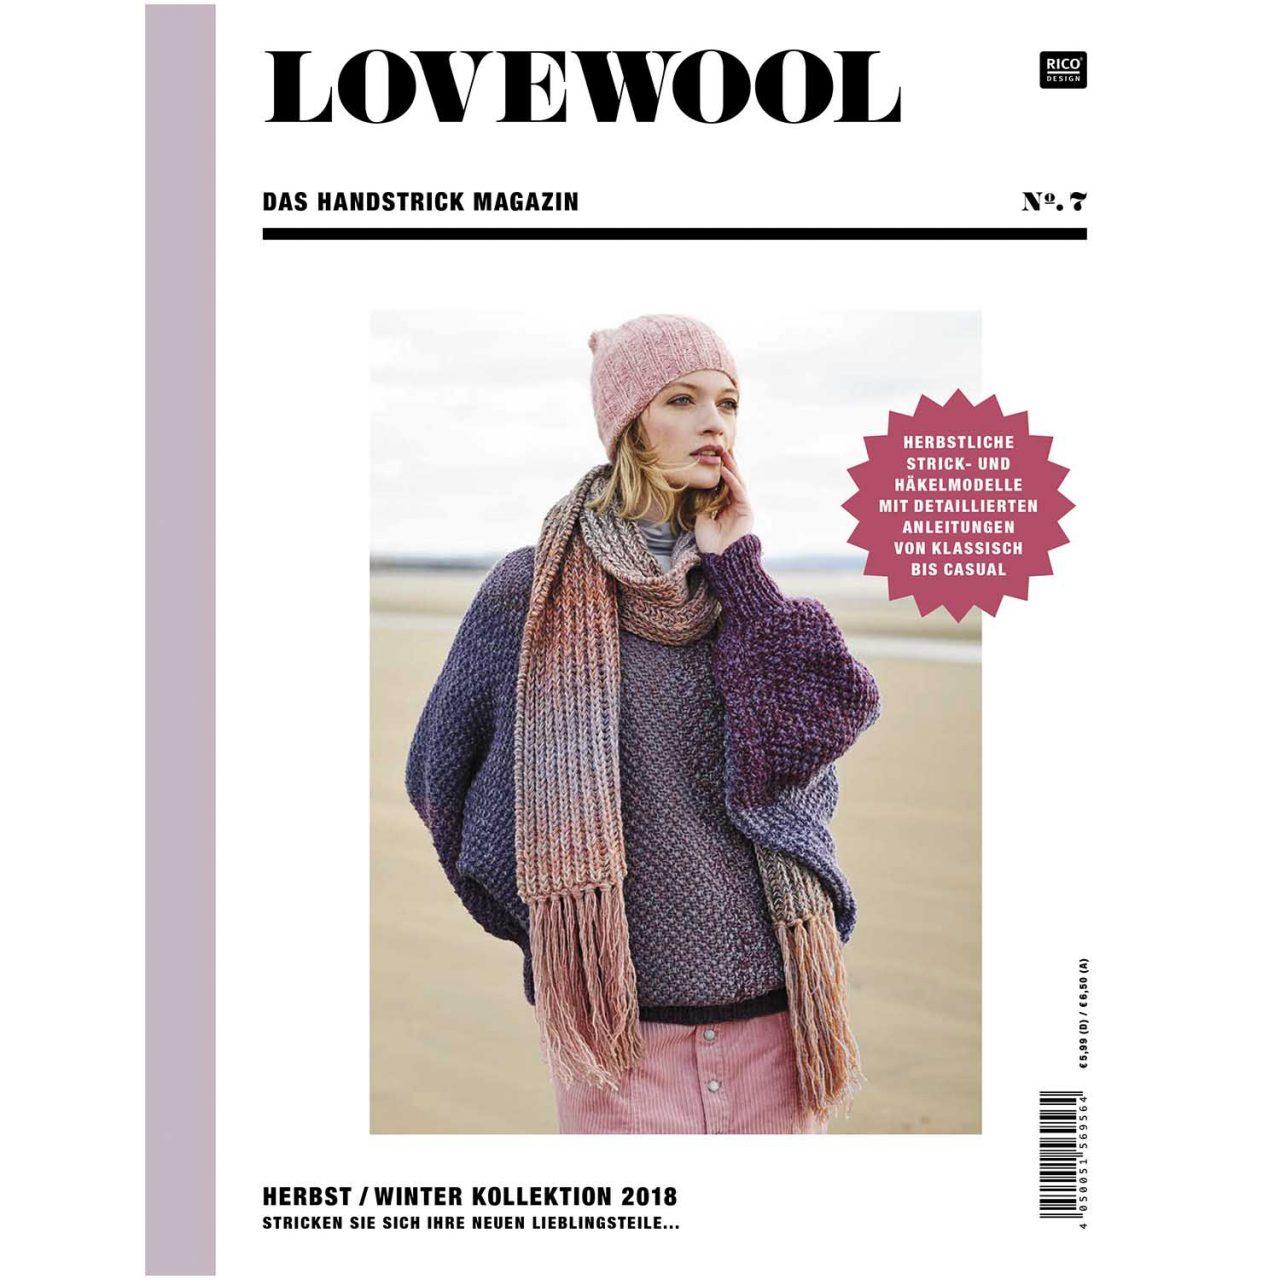 Love Wool nr.7 Rico